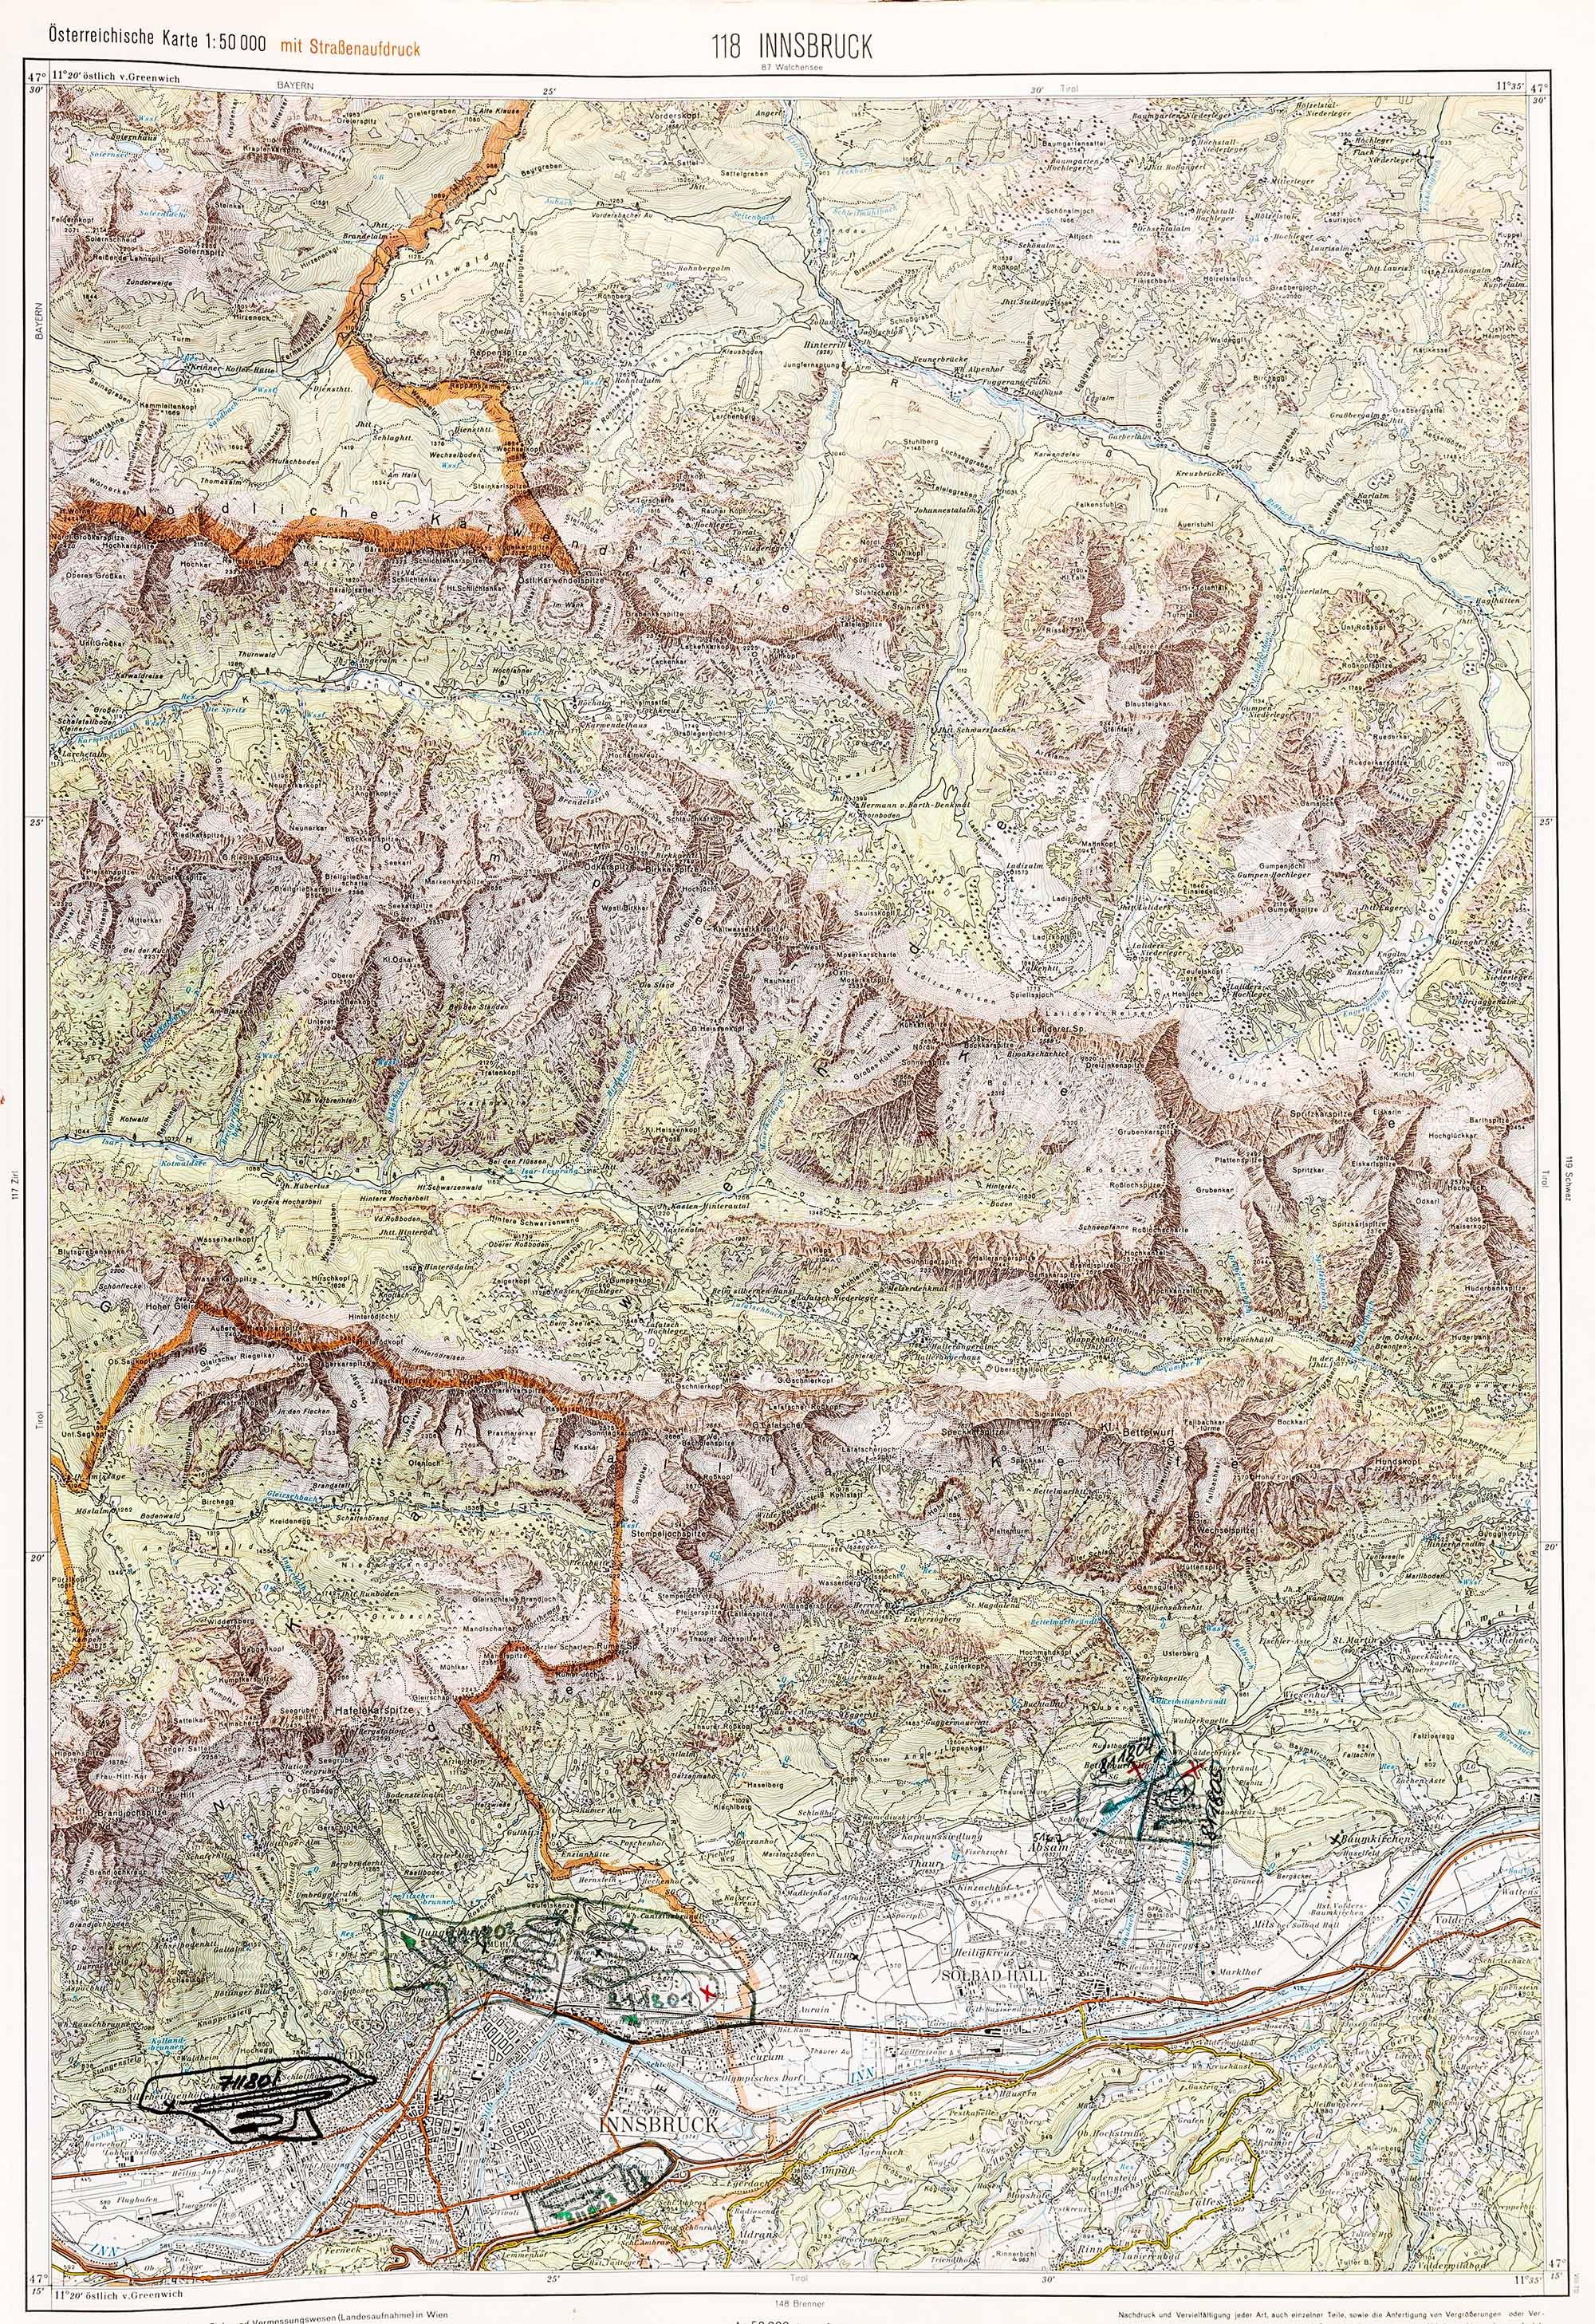 1975-1979 Karte 118